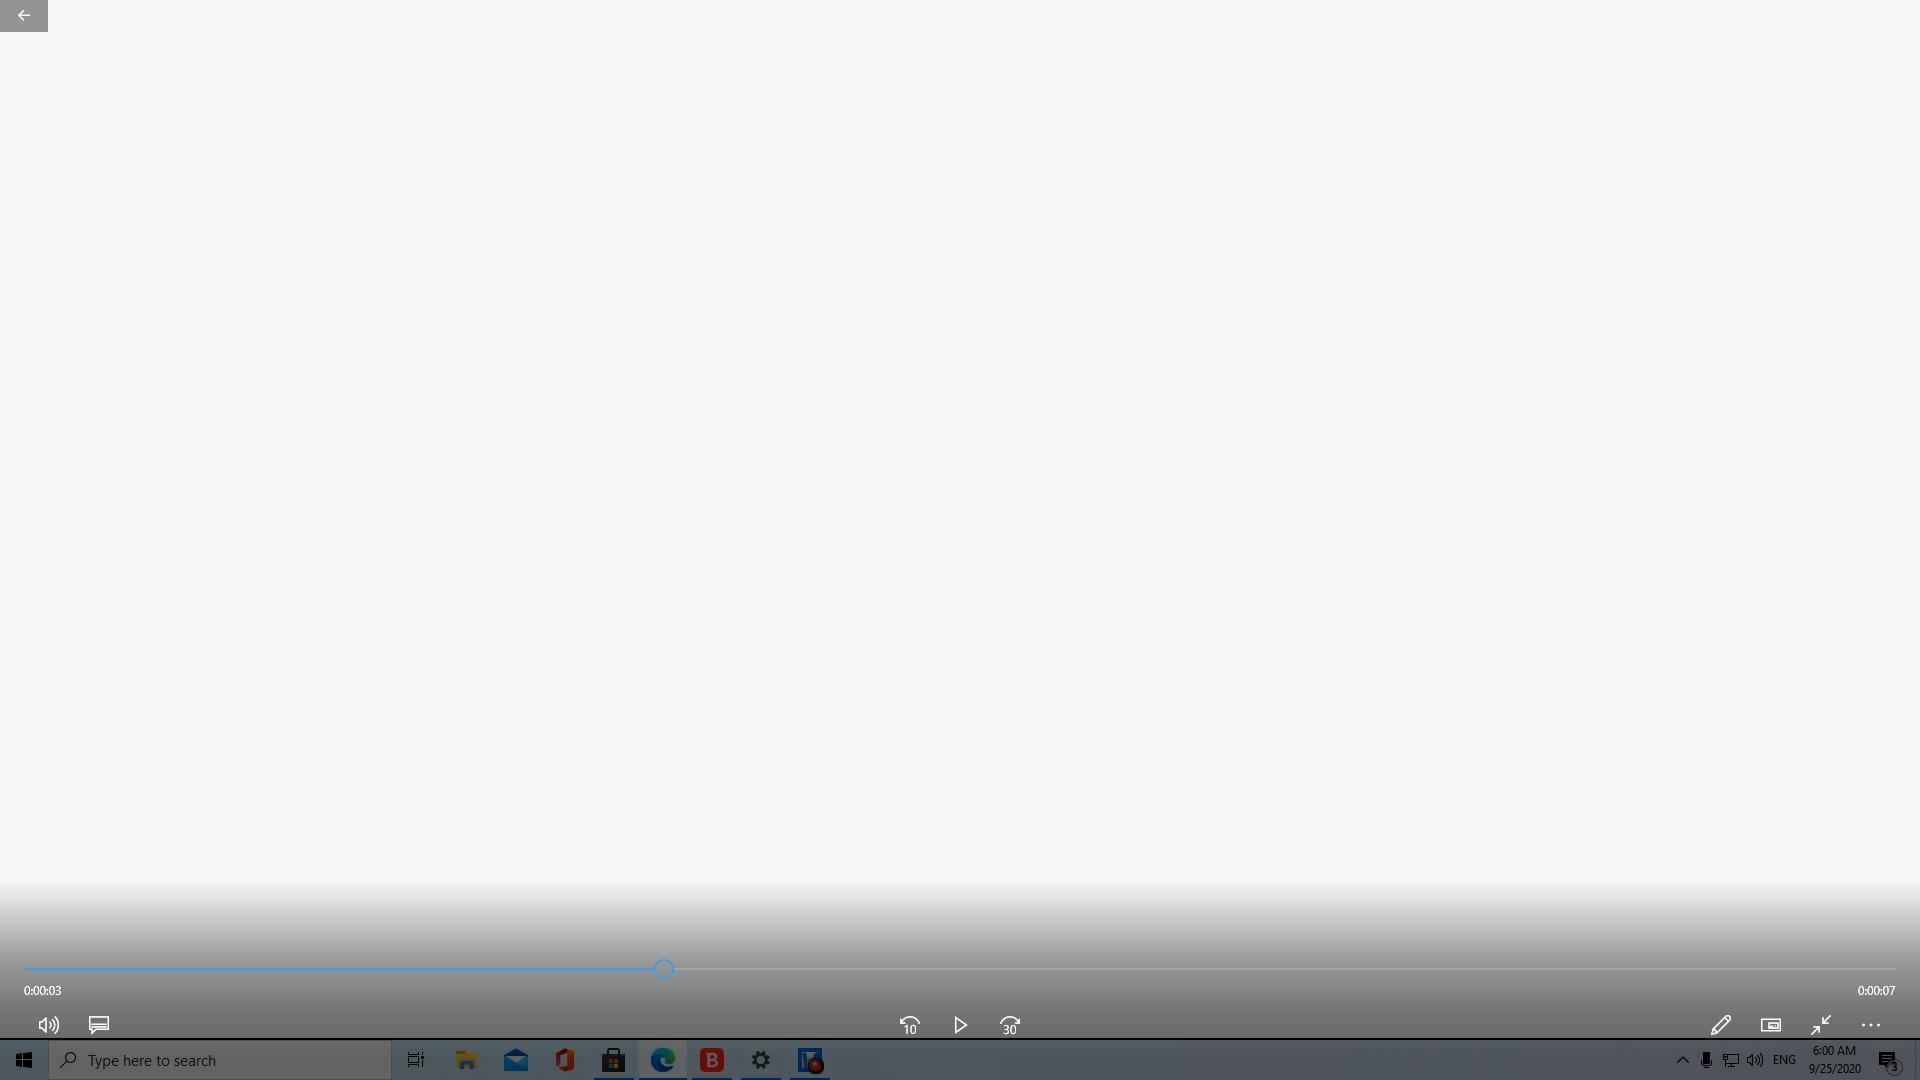 Troubleshoot Microsoft Edge 39aa7efe-7b84-469f-97e8-032c909061bf?upload=true.png